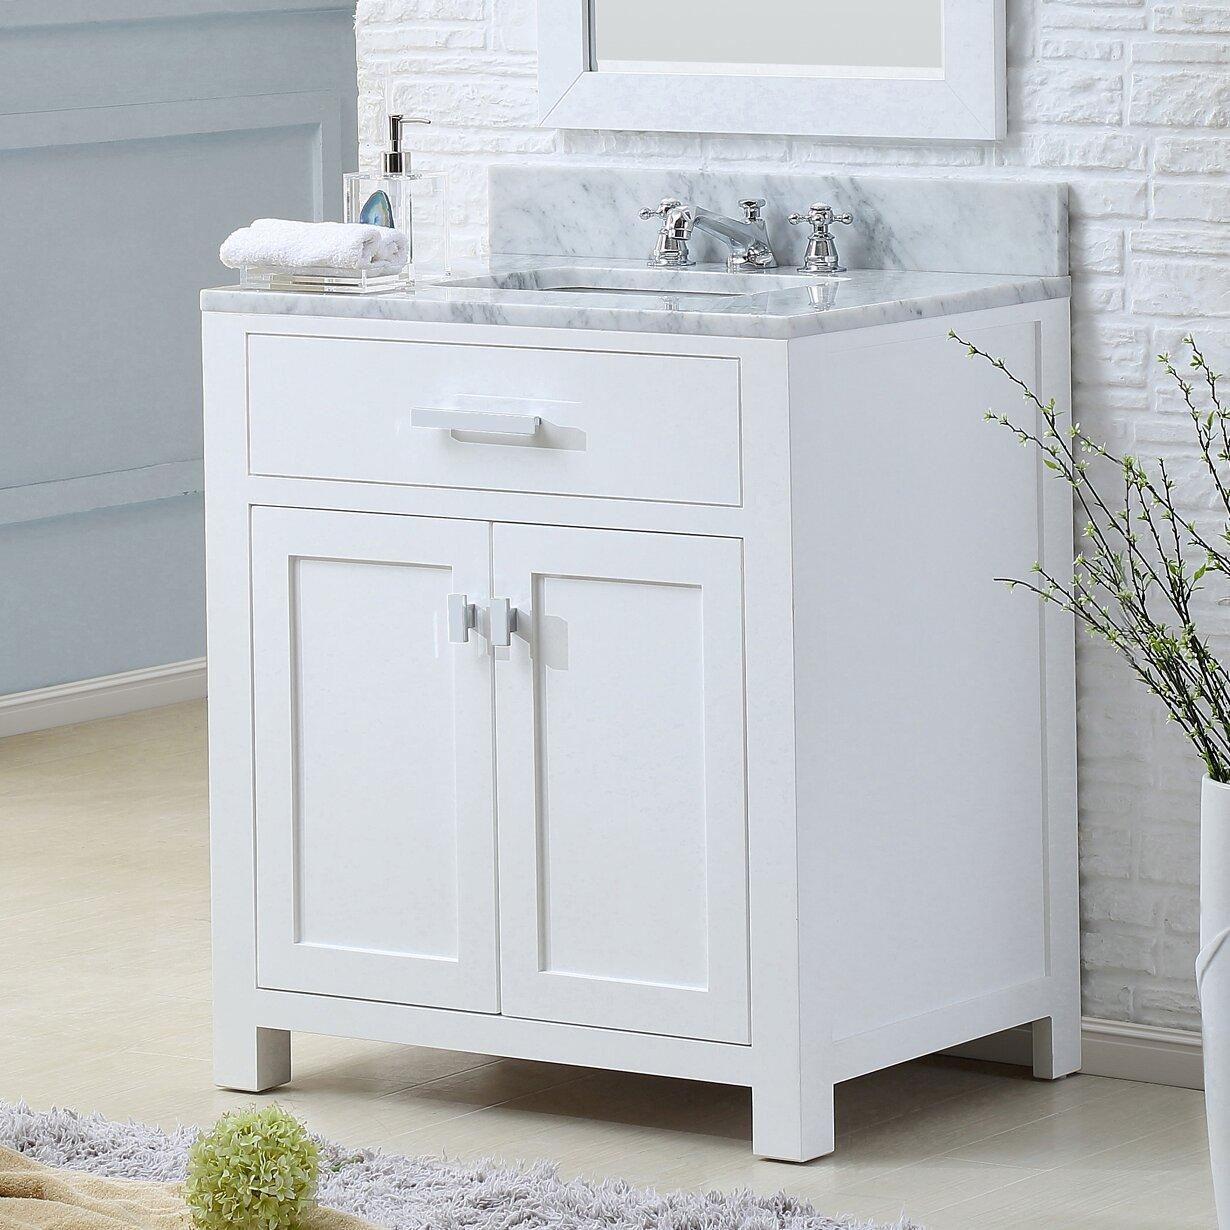 30 Bathroom Cabinet Dcor Design Creighton 30 Single Bathroom Vanity Set Reviews